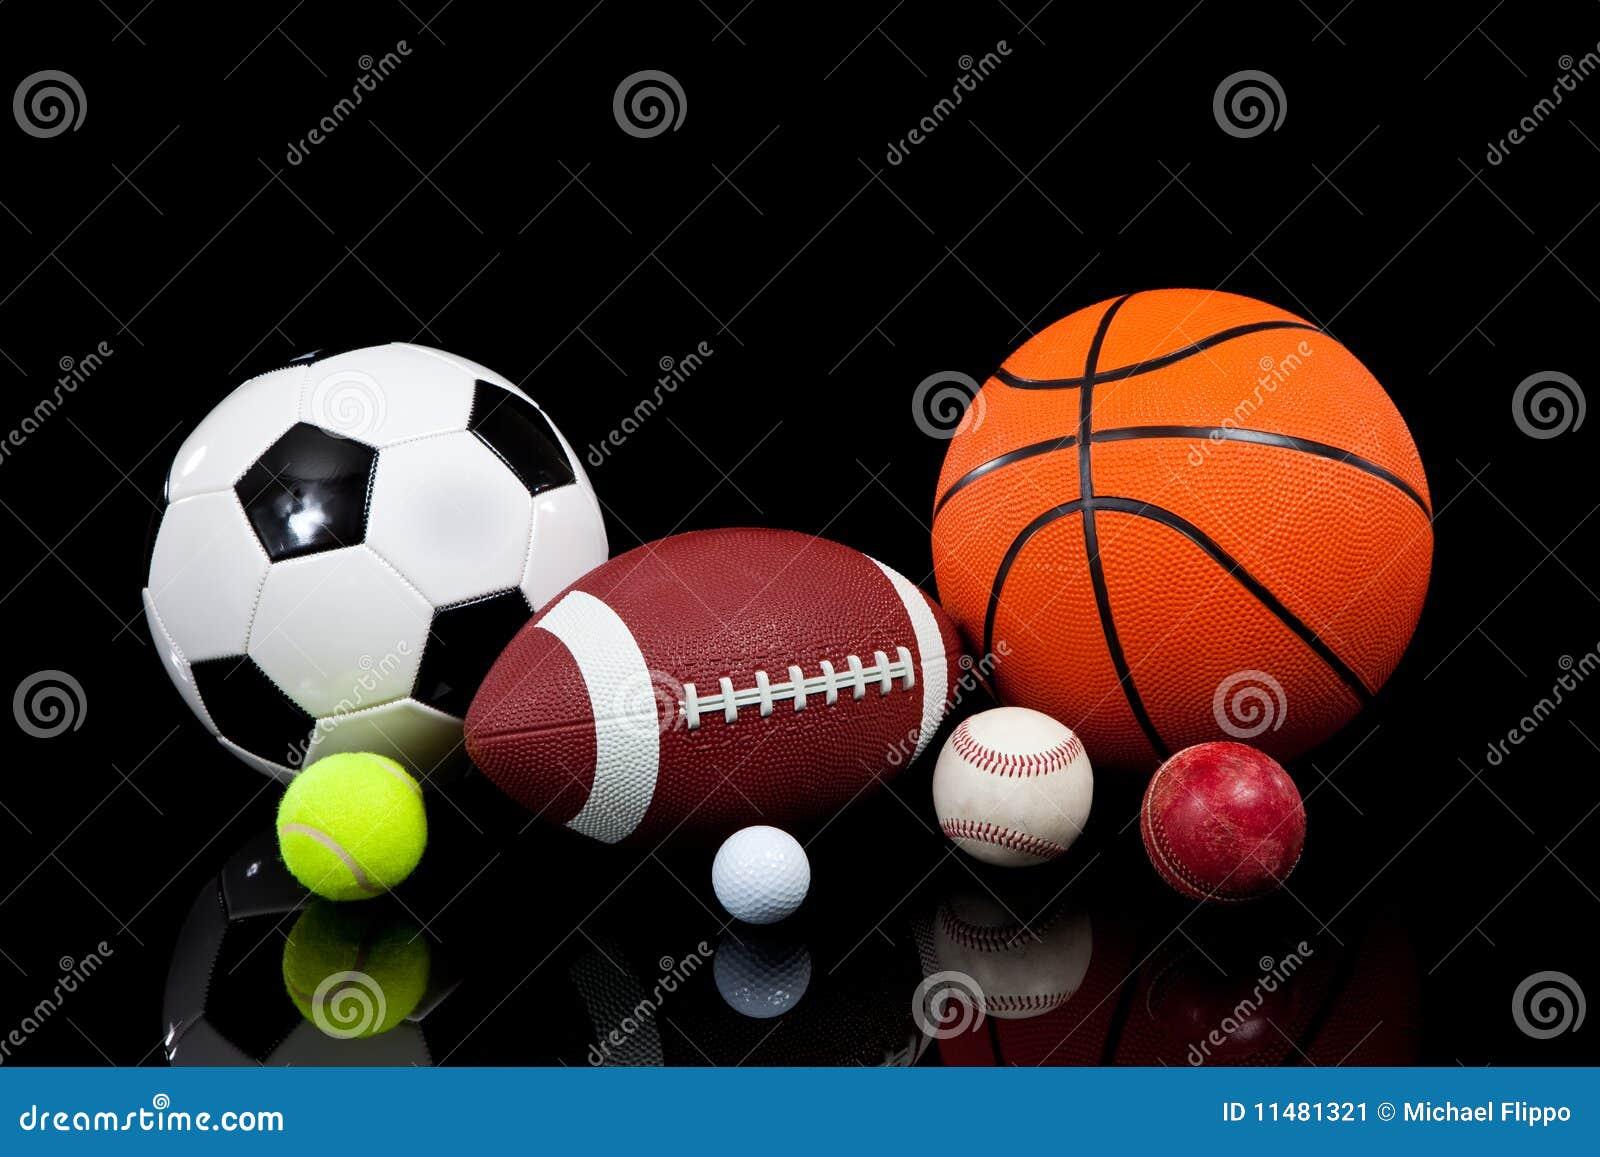 Fondos De Pantalla Fútbol Pelota Silueta Deporte: Bolas Clasificadas De Los Deportes En Un Fondo Negro